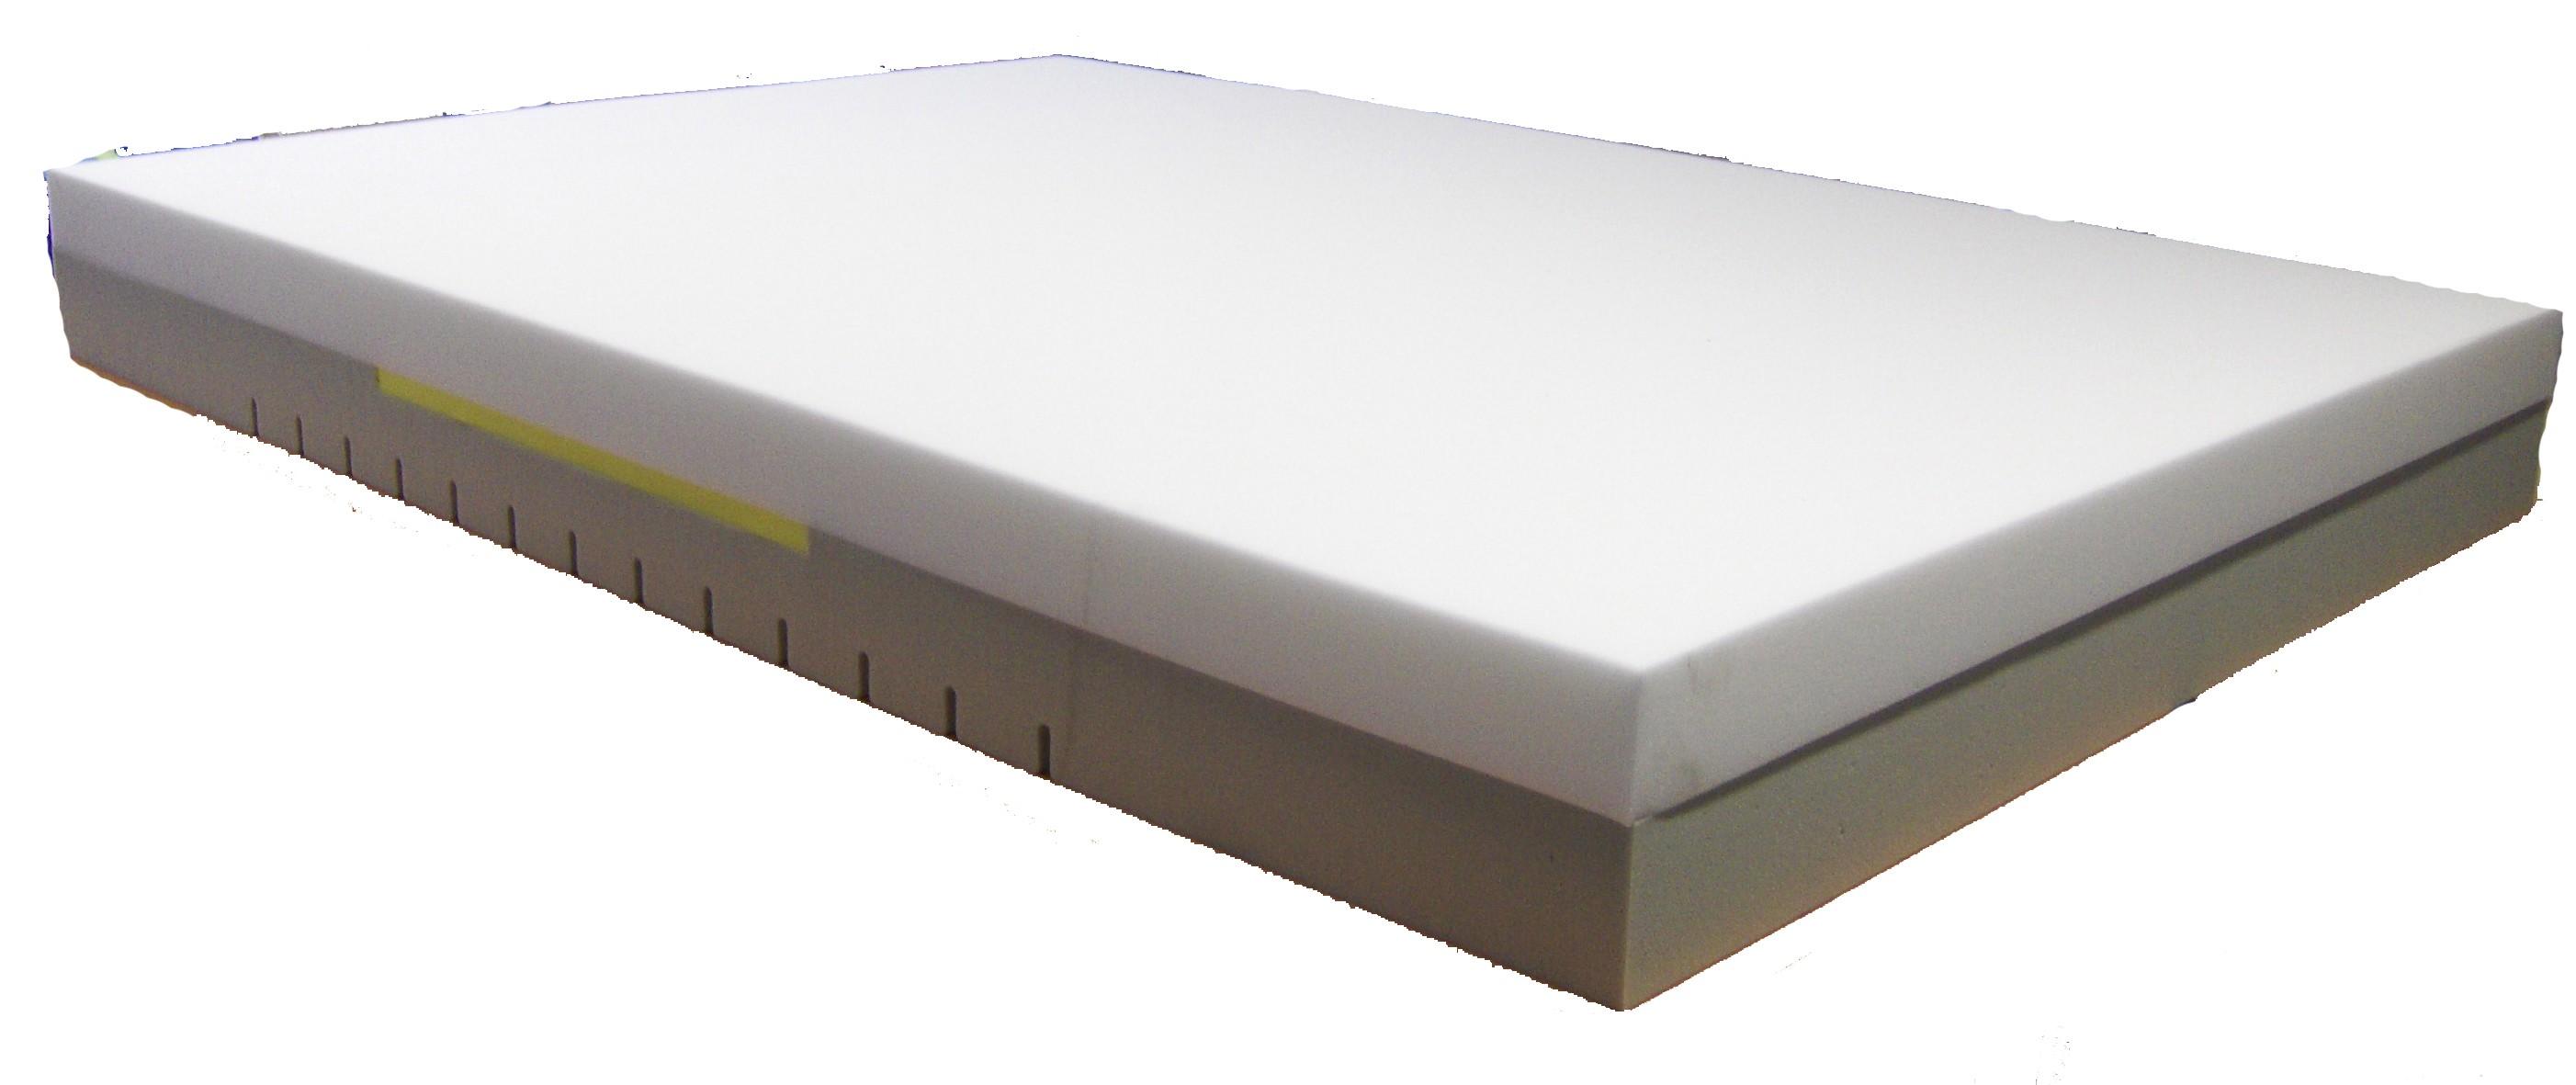 g nial matelas anti escarre id es de bain de soleil. Black Bedroom Furniture Sets. Home Design Ideas